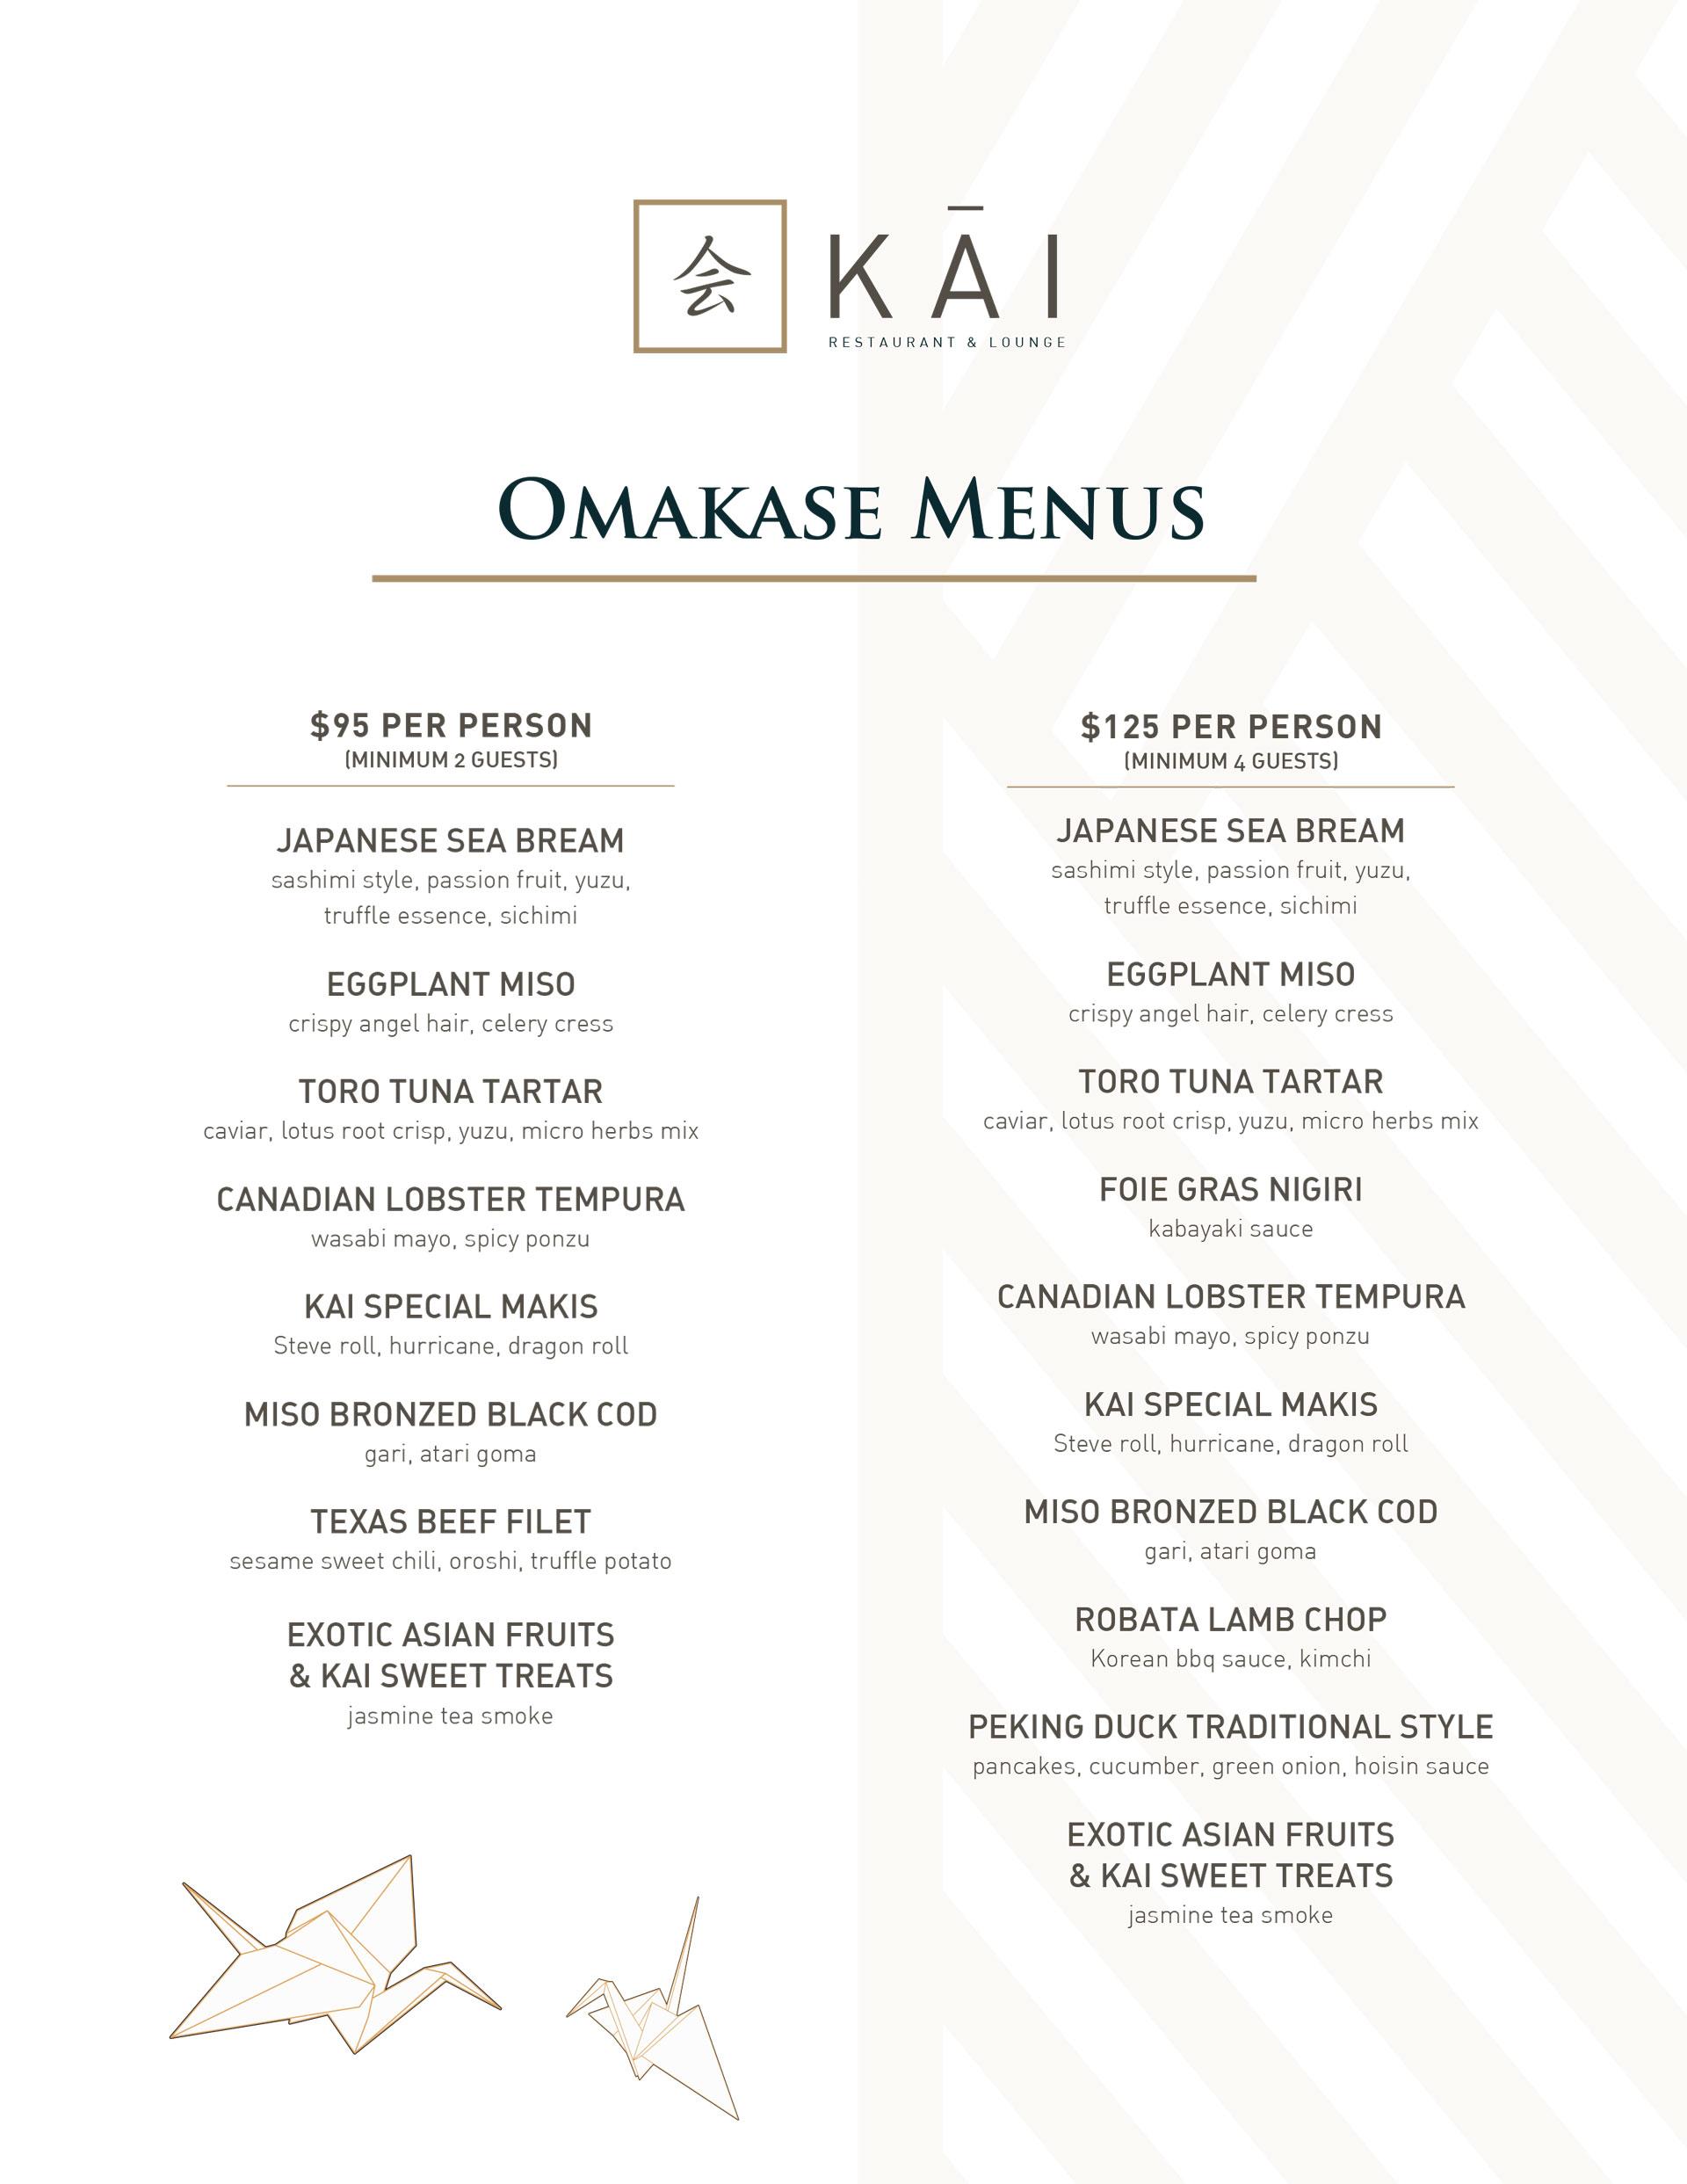 KAI-Omakase-6.7.19-2.jpg